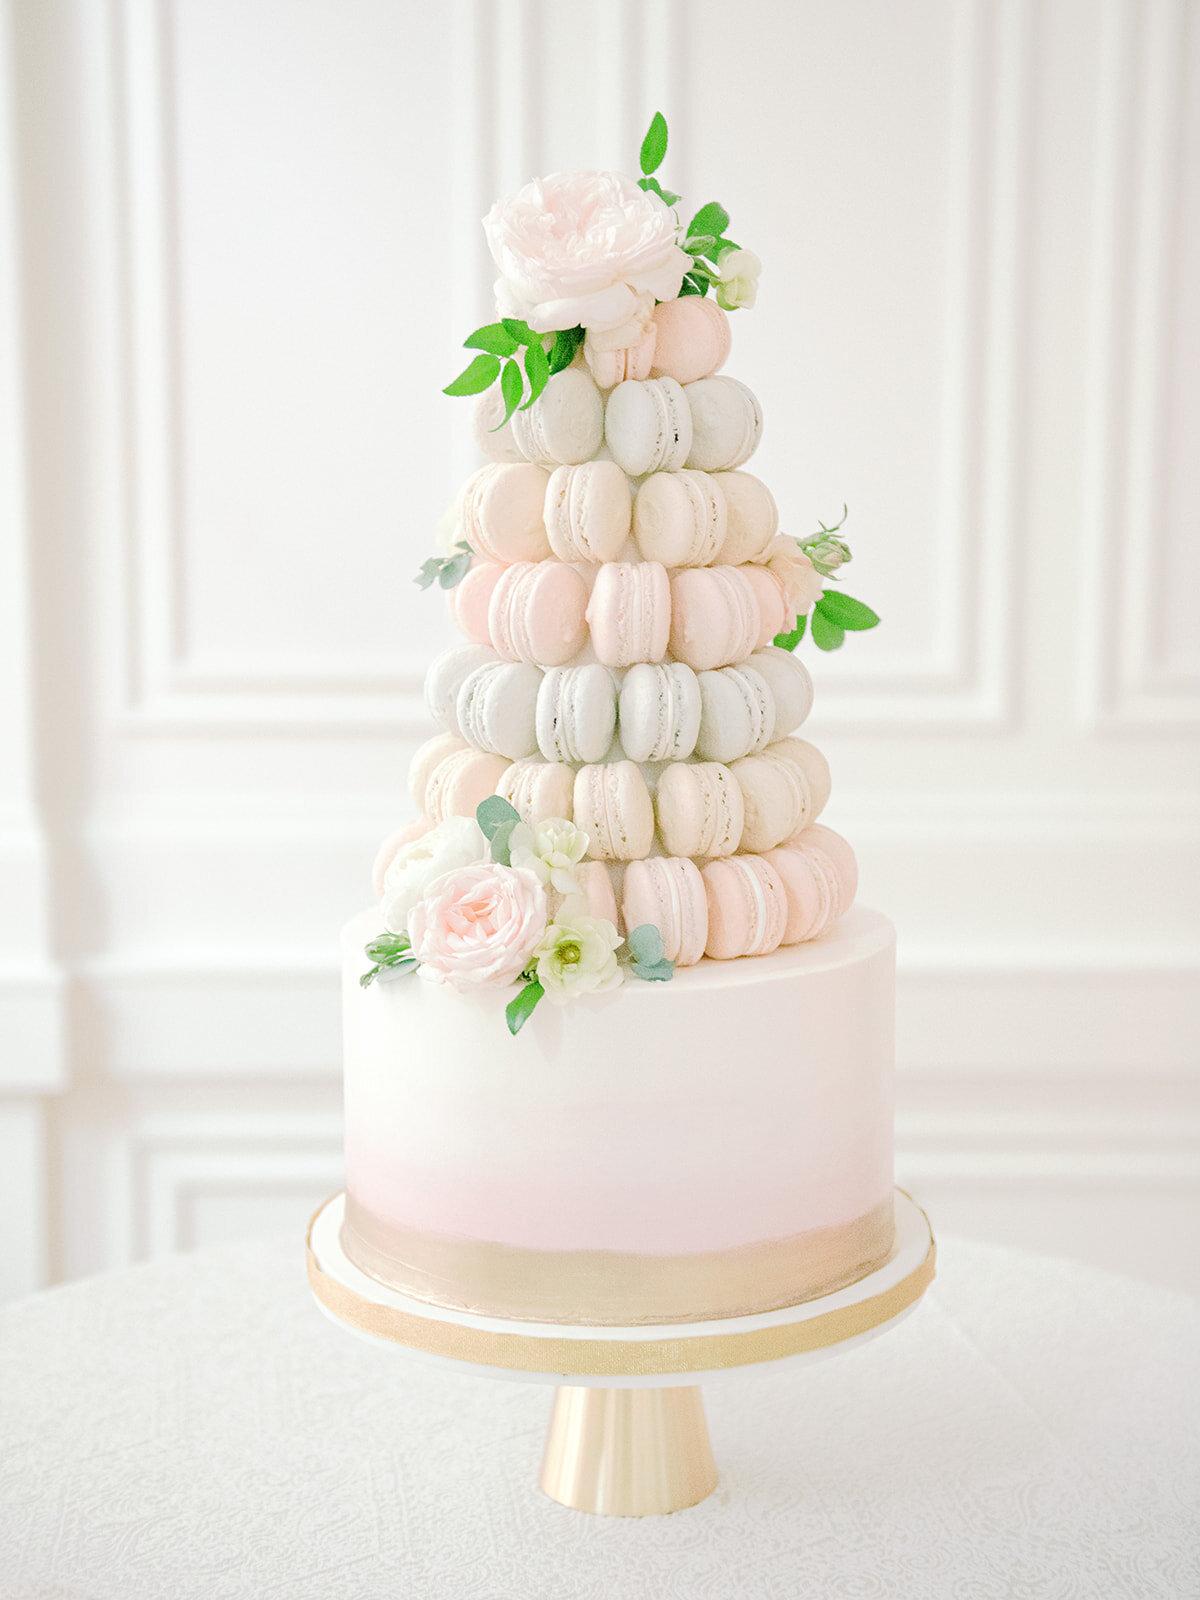 Macaron cake in light pastel color palette. Nashville wedding florist at the Noelle.